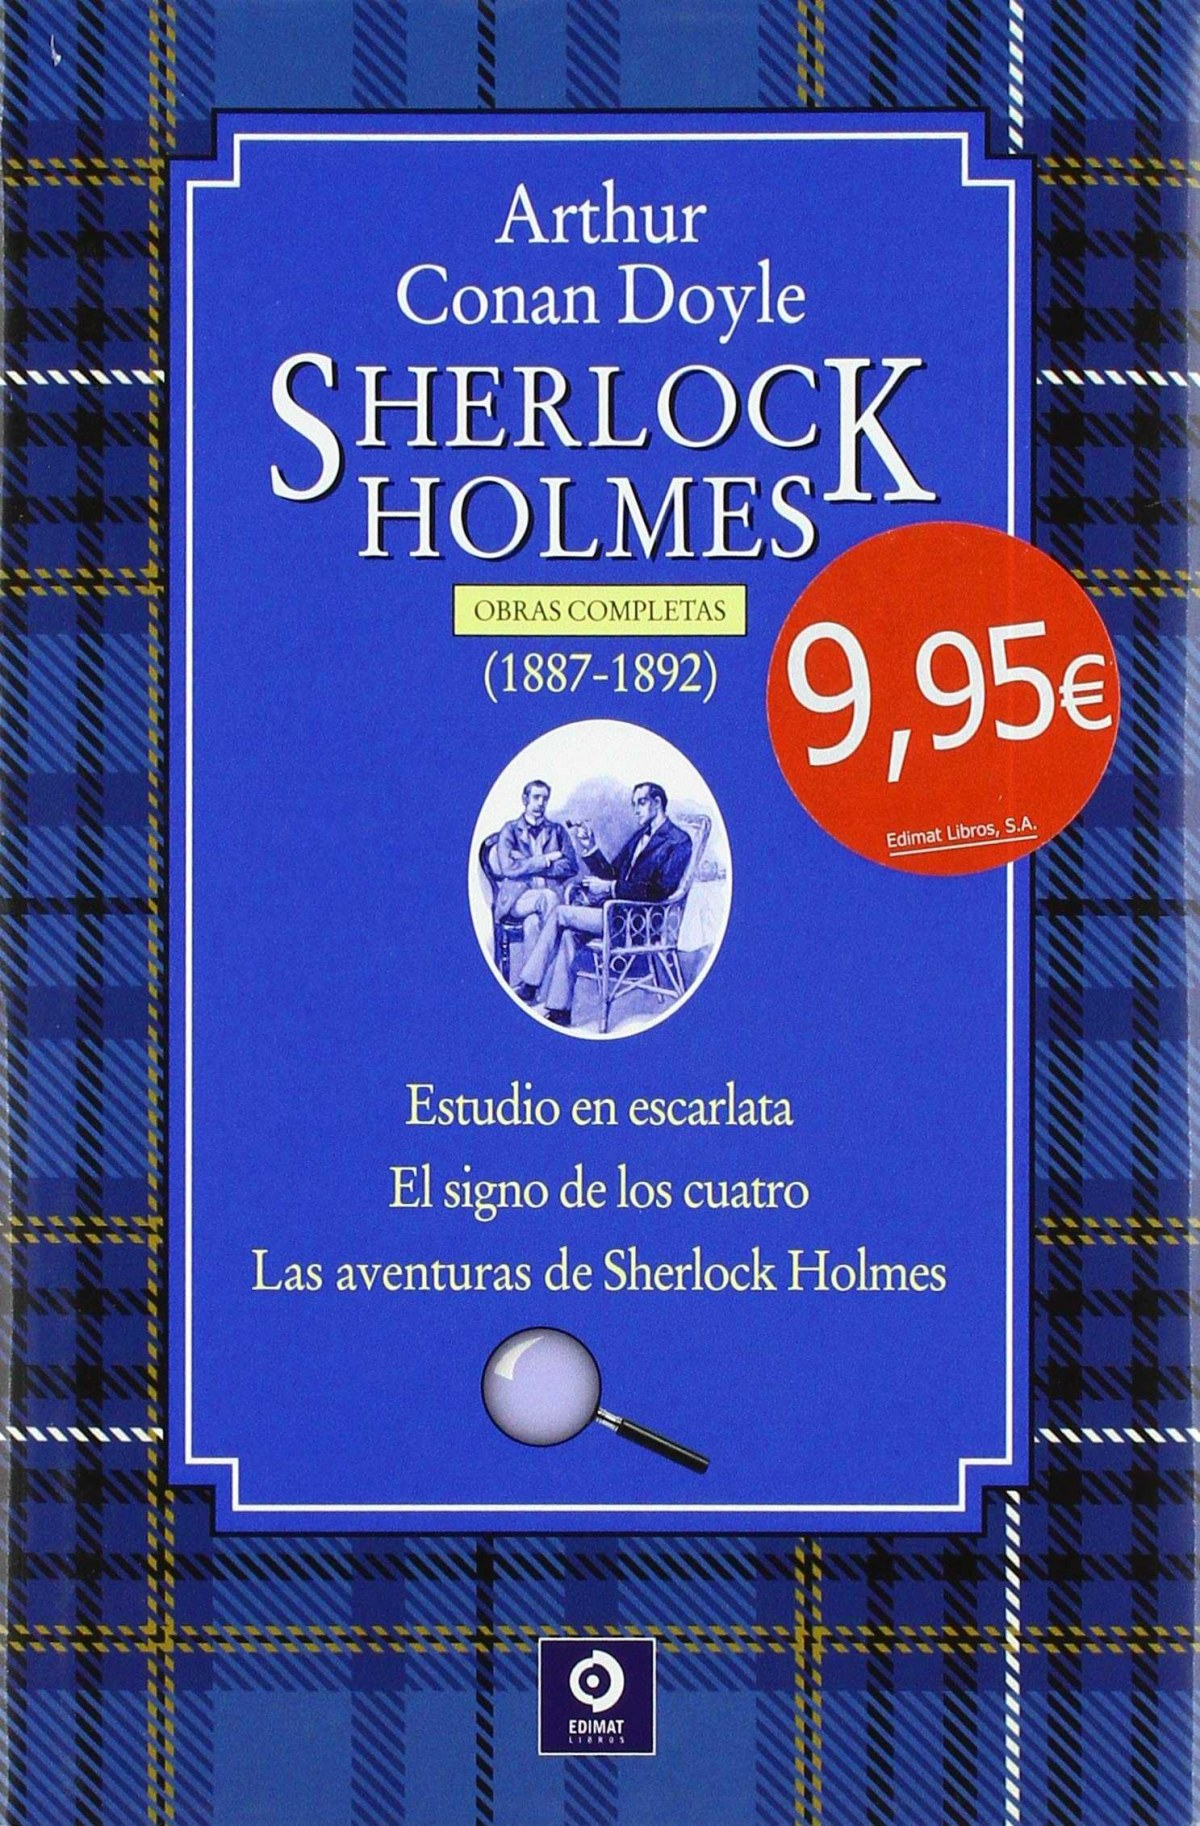 SHERLOCK HOLMES 1887-1892